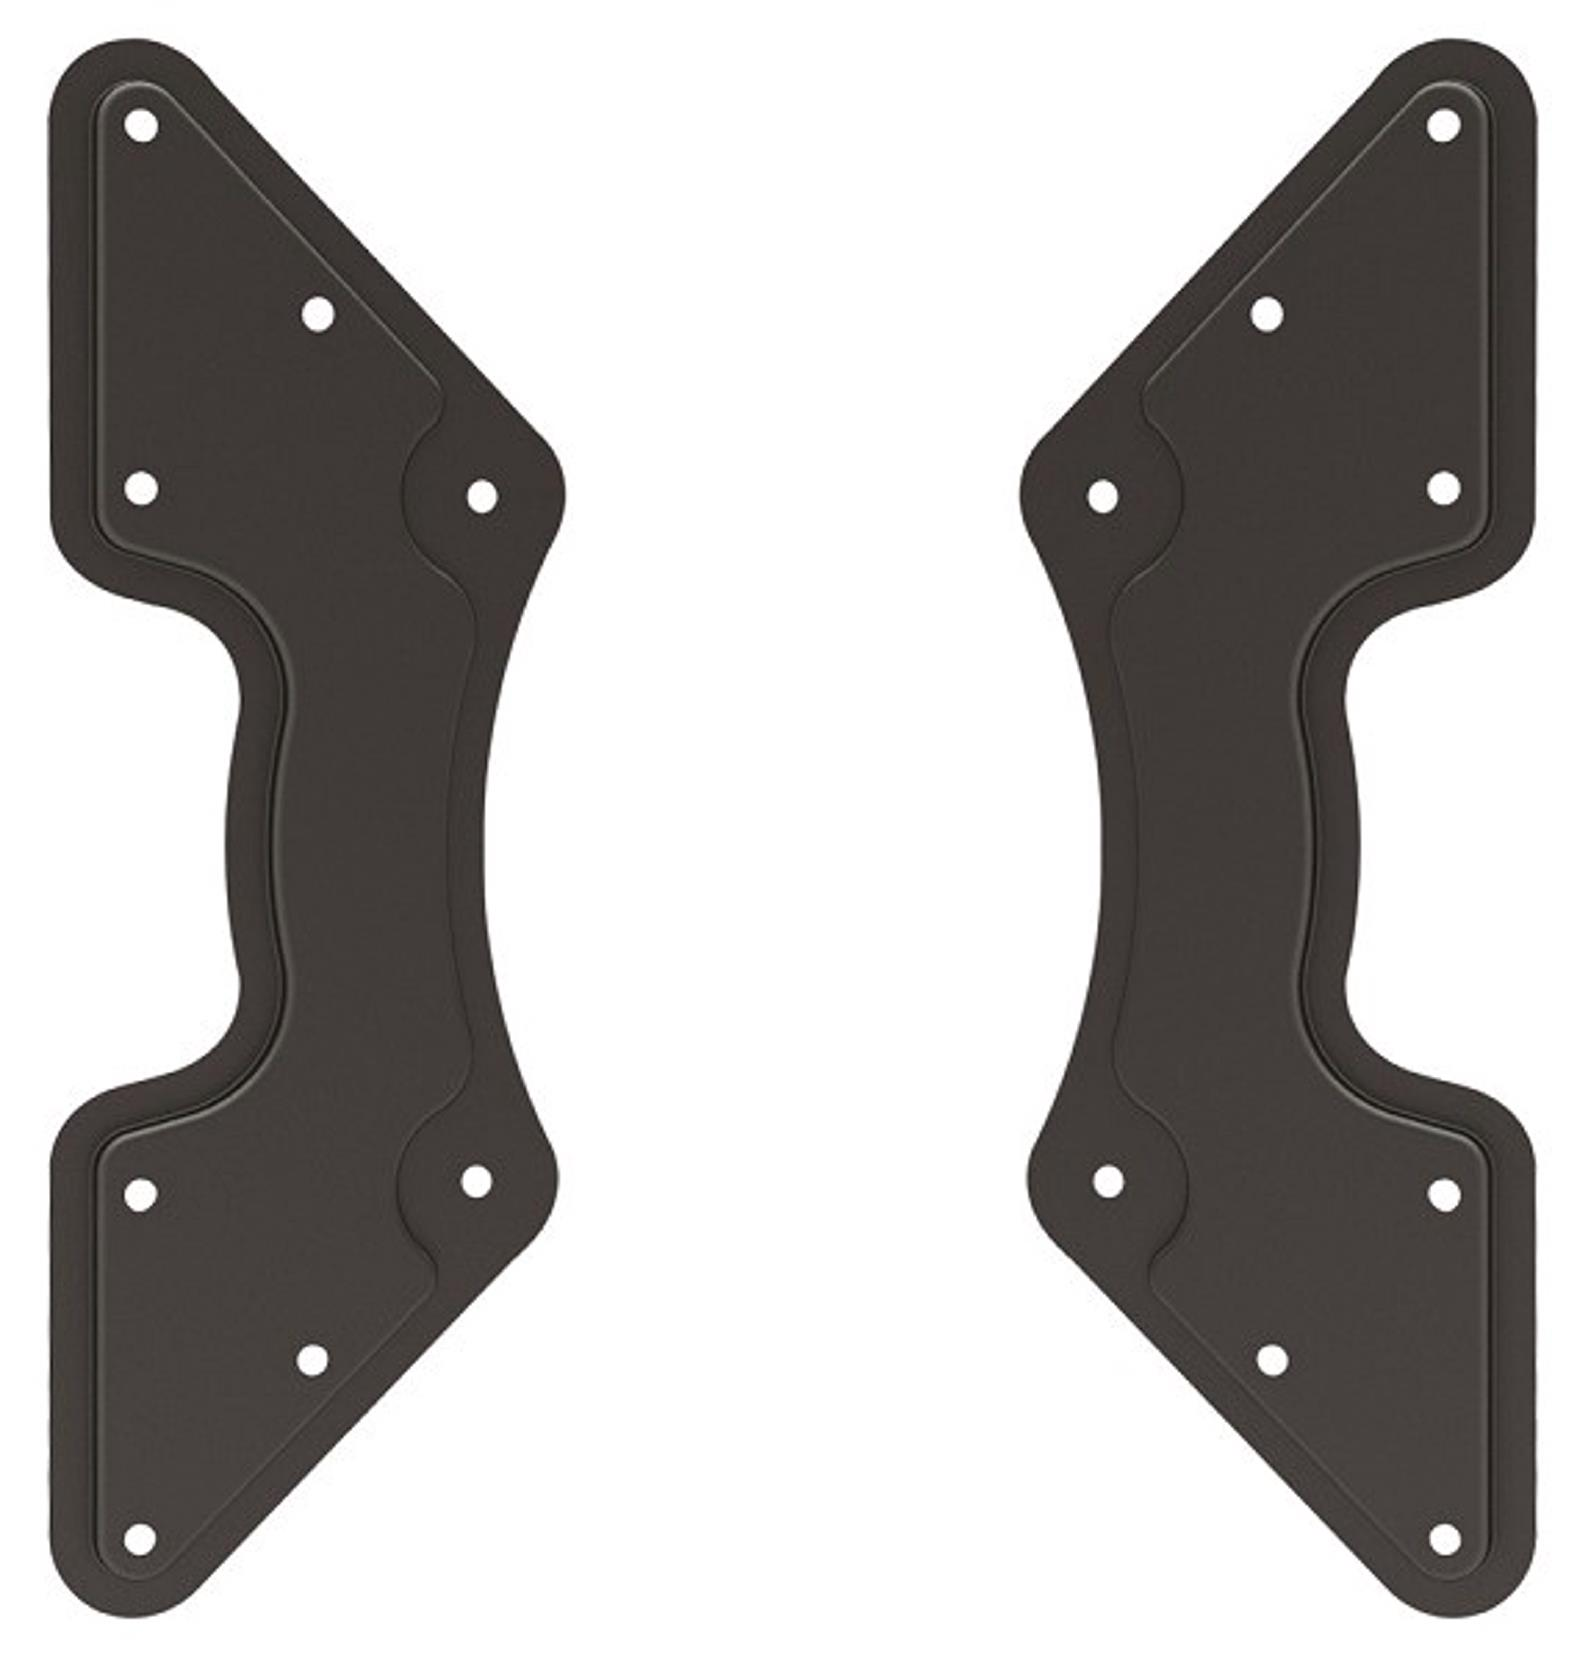 NewStar FPMA-VESA440 VESA Adaptor Plate for Screens up to 52 inch